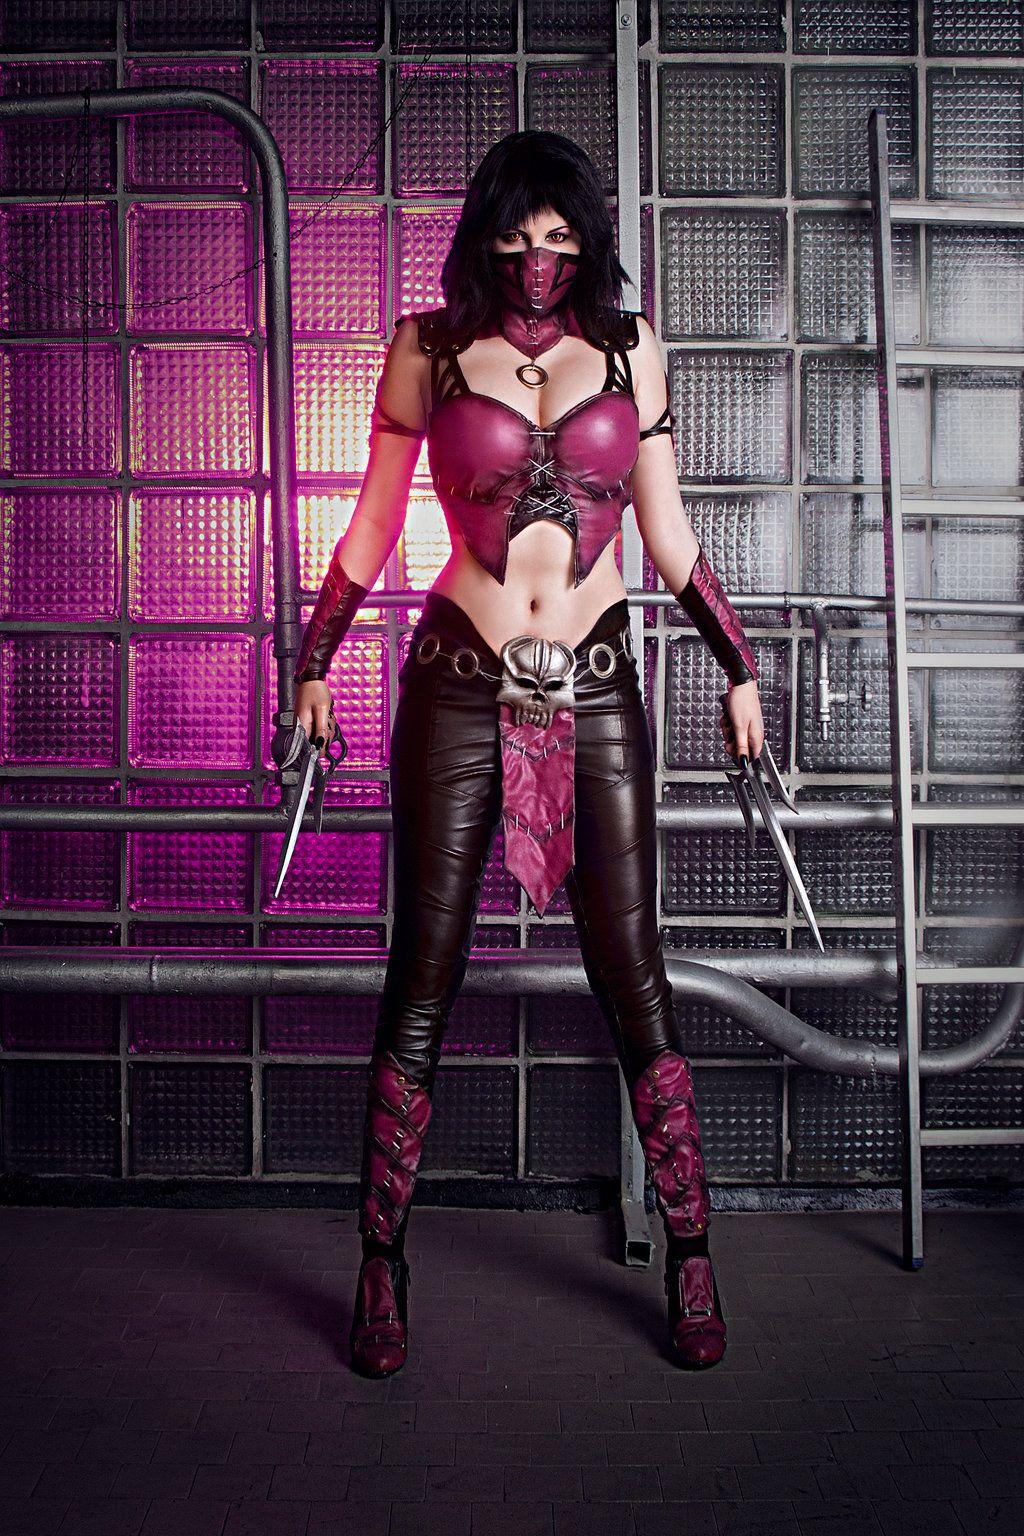 Mileena (Flesh Pit Skin) Cosplay - Mortal Kombat 9 by